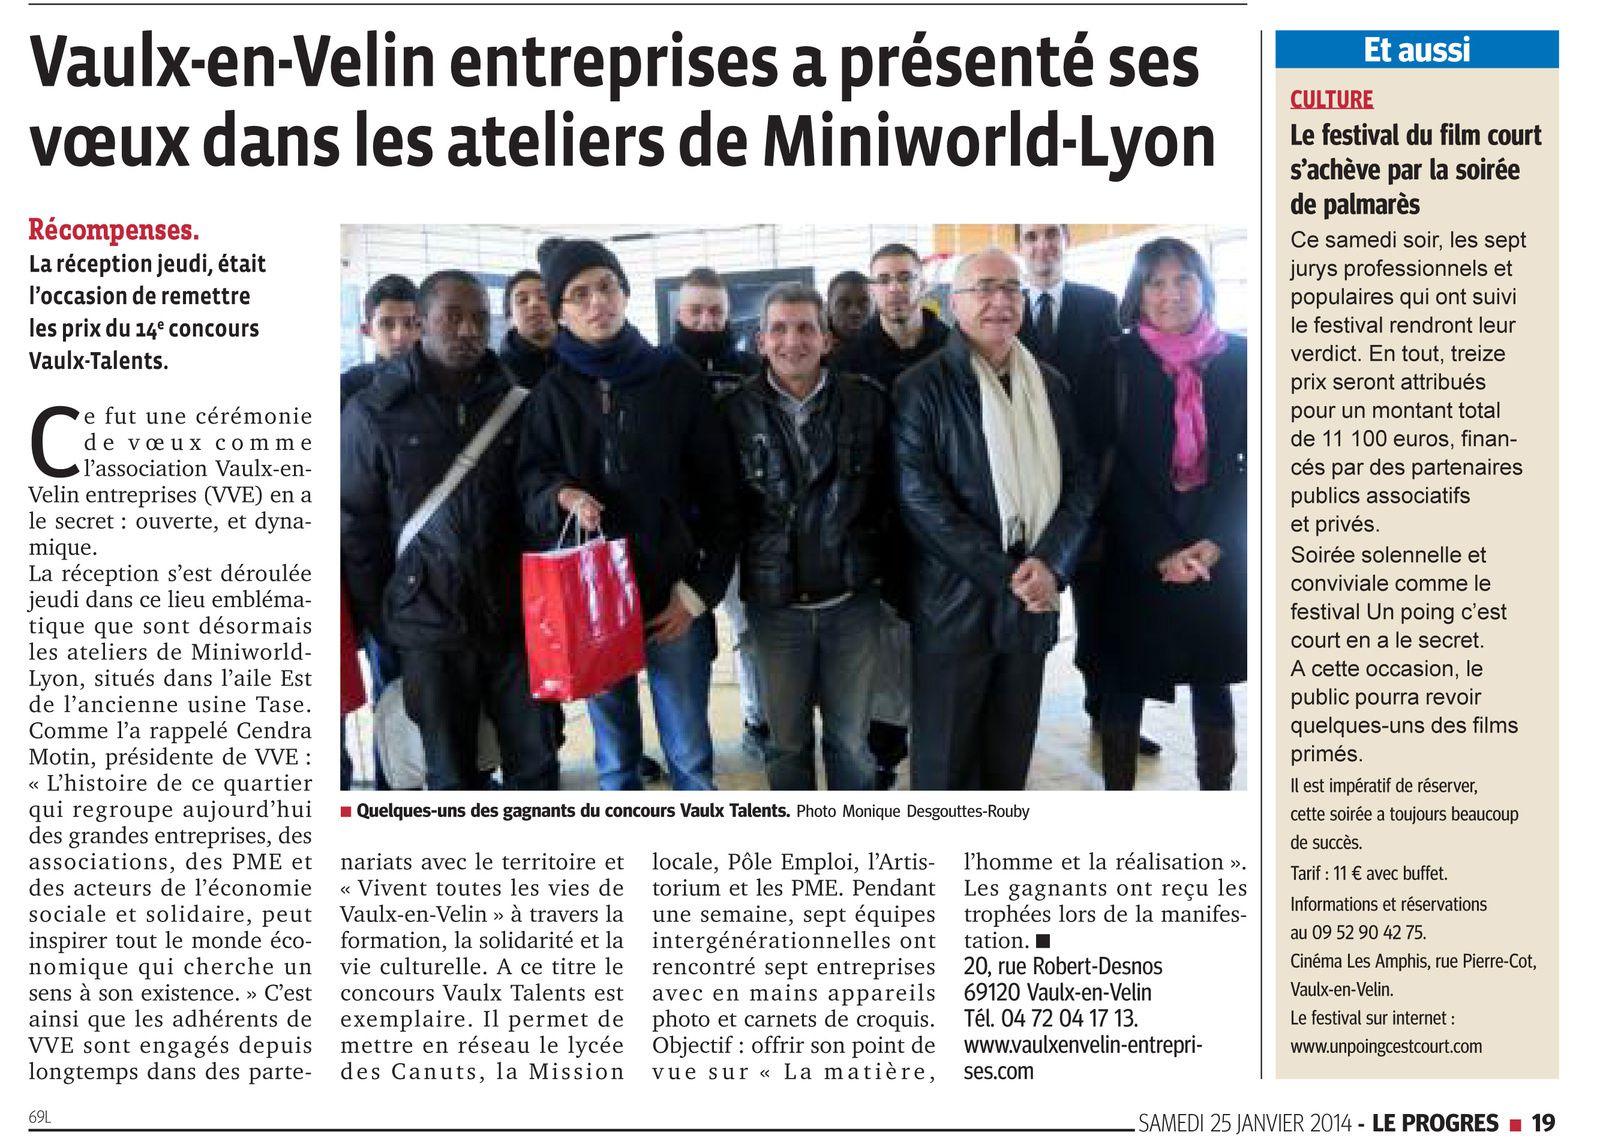 Le Progrès de Lyon du samedi 25 janvier 2014.